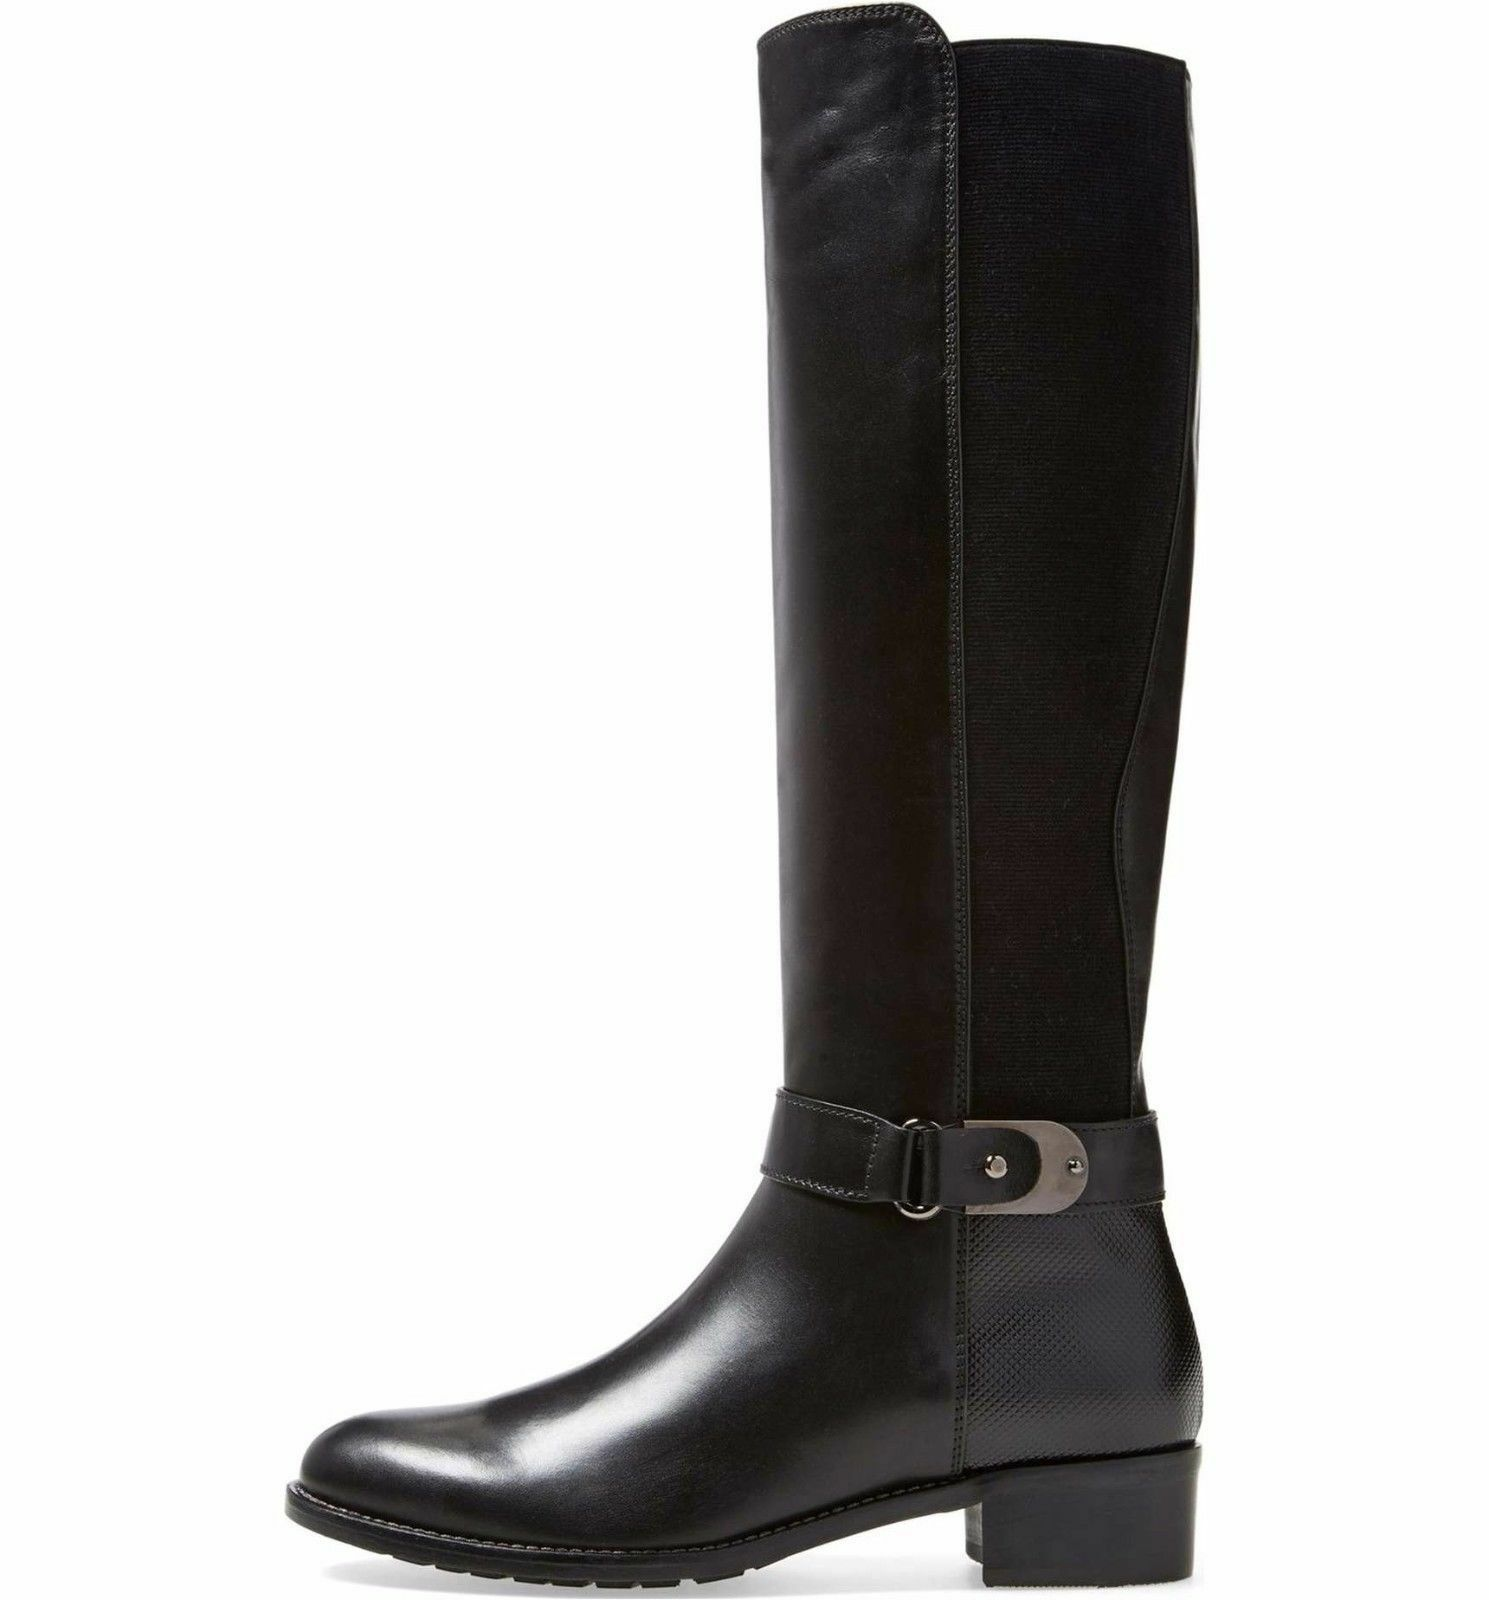 AQUATALIA Olita Riding Boots Black Soft Leather Wide Regular Calf Tall 4 5  495